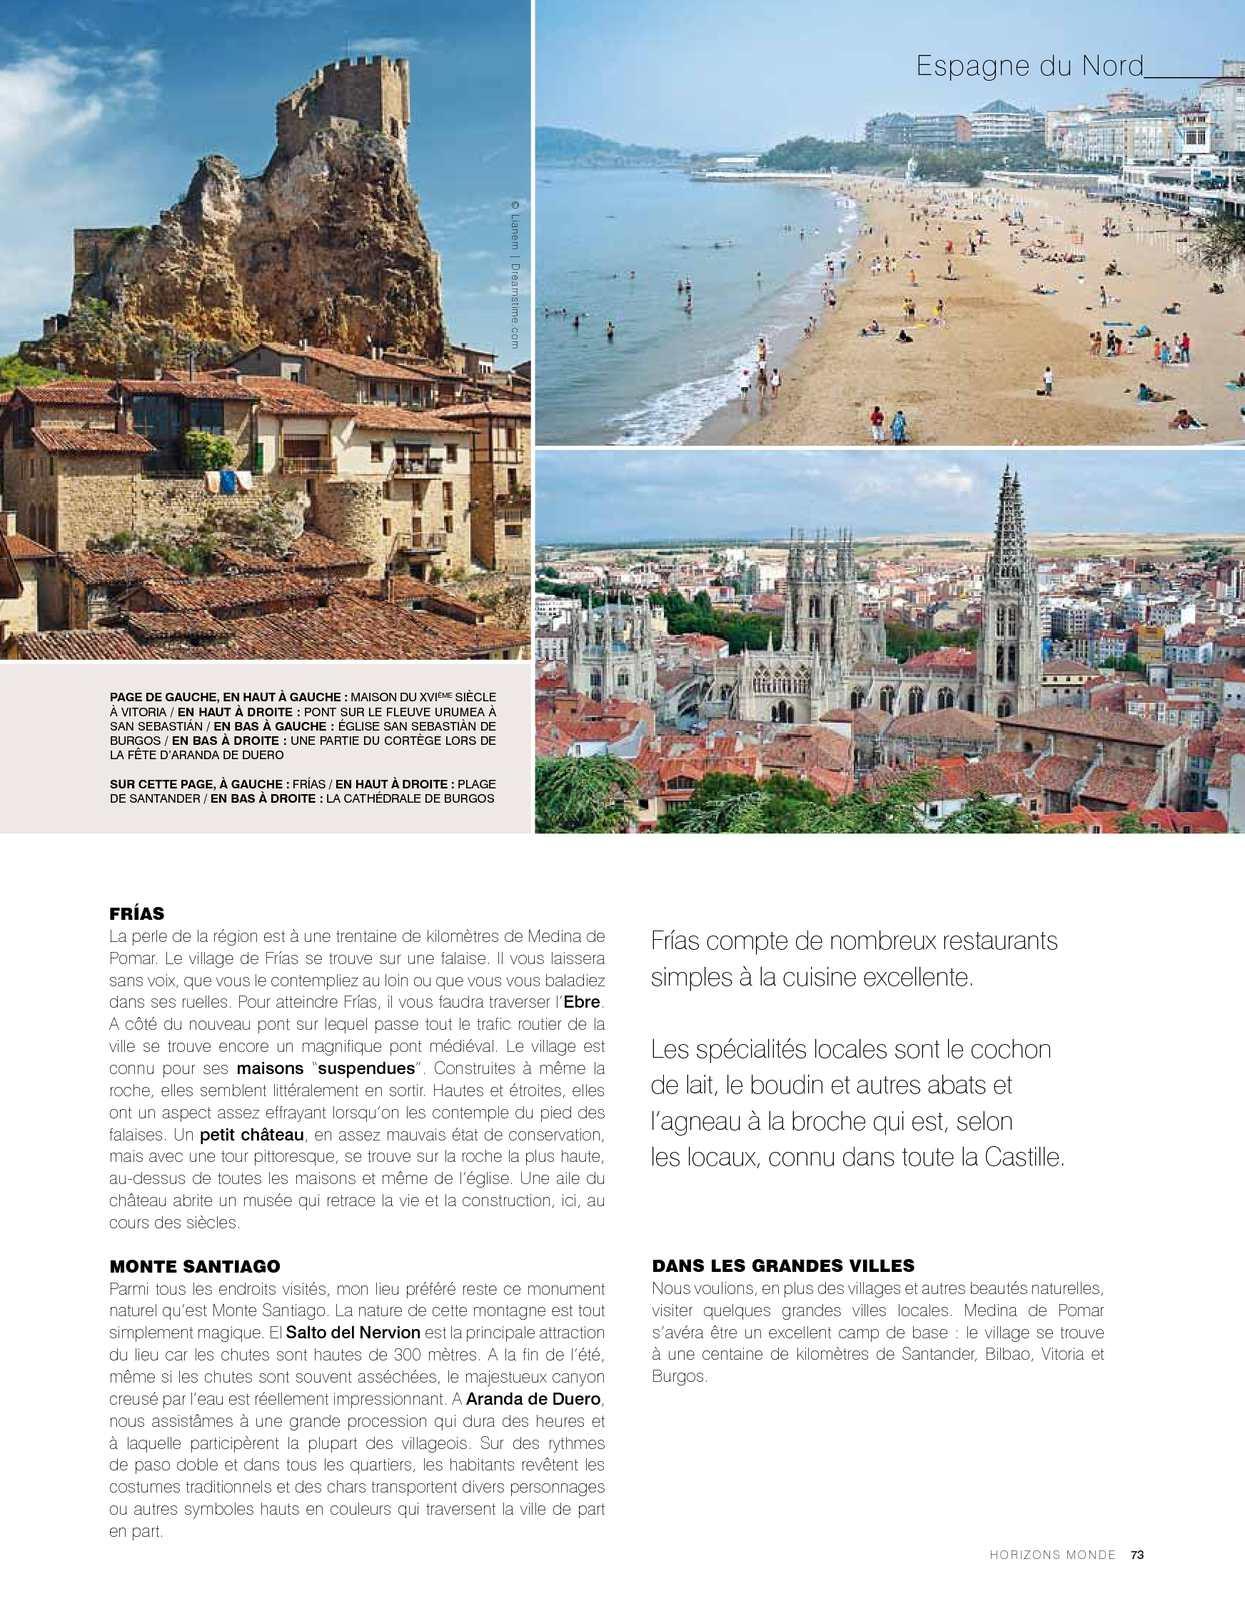 La Maison Du Monde Bilbao horizons monde n°5 automne 2011 - calameo downloader